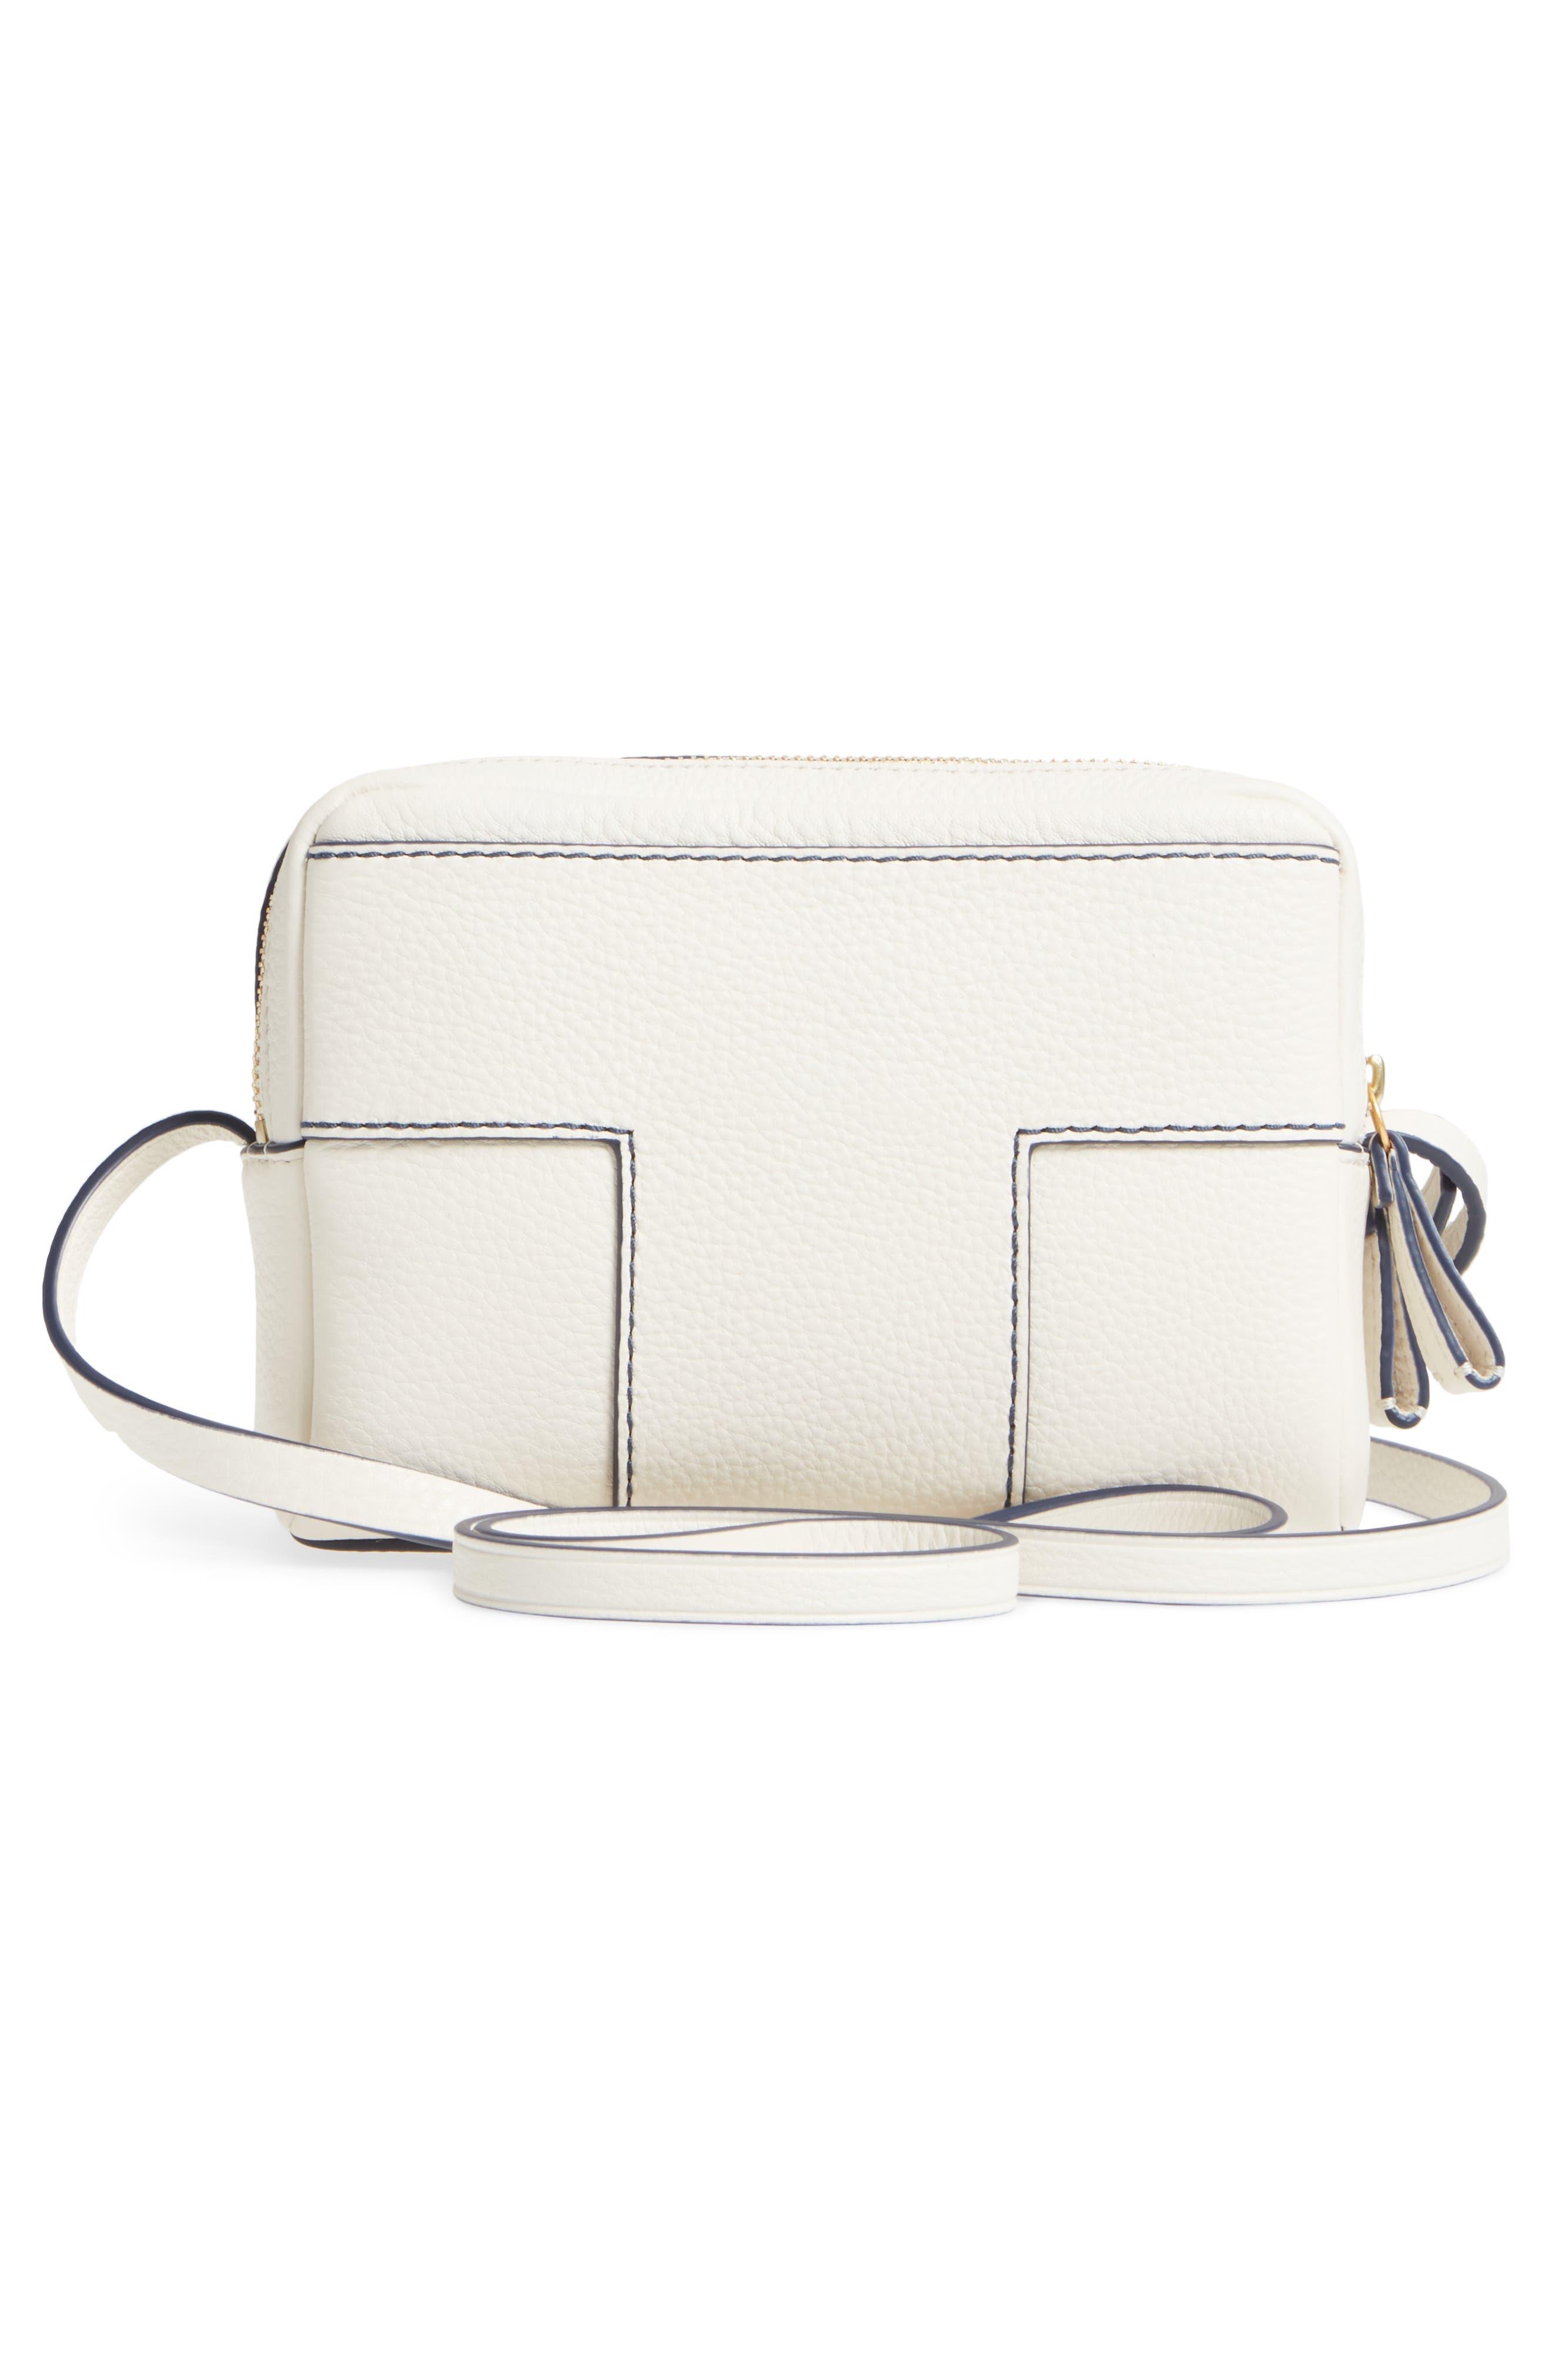 Block-T Double Zip Leather Crossbody Bag,                             Alternate thumbnail 5, color,